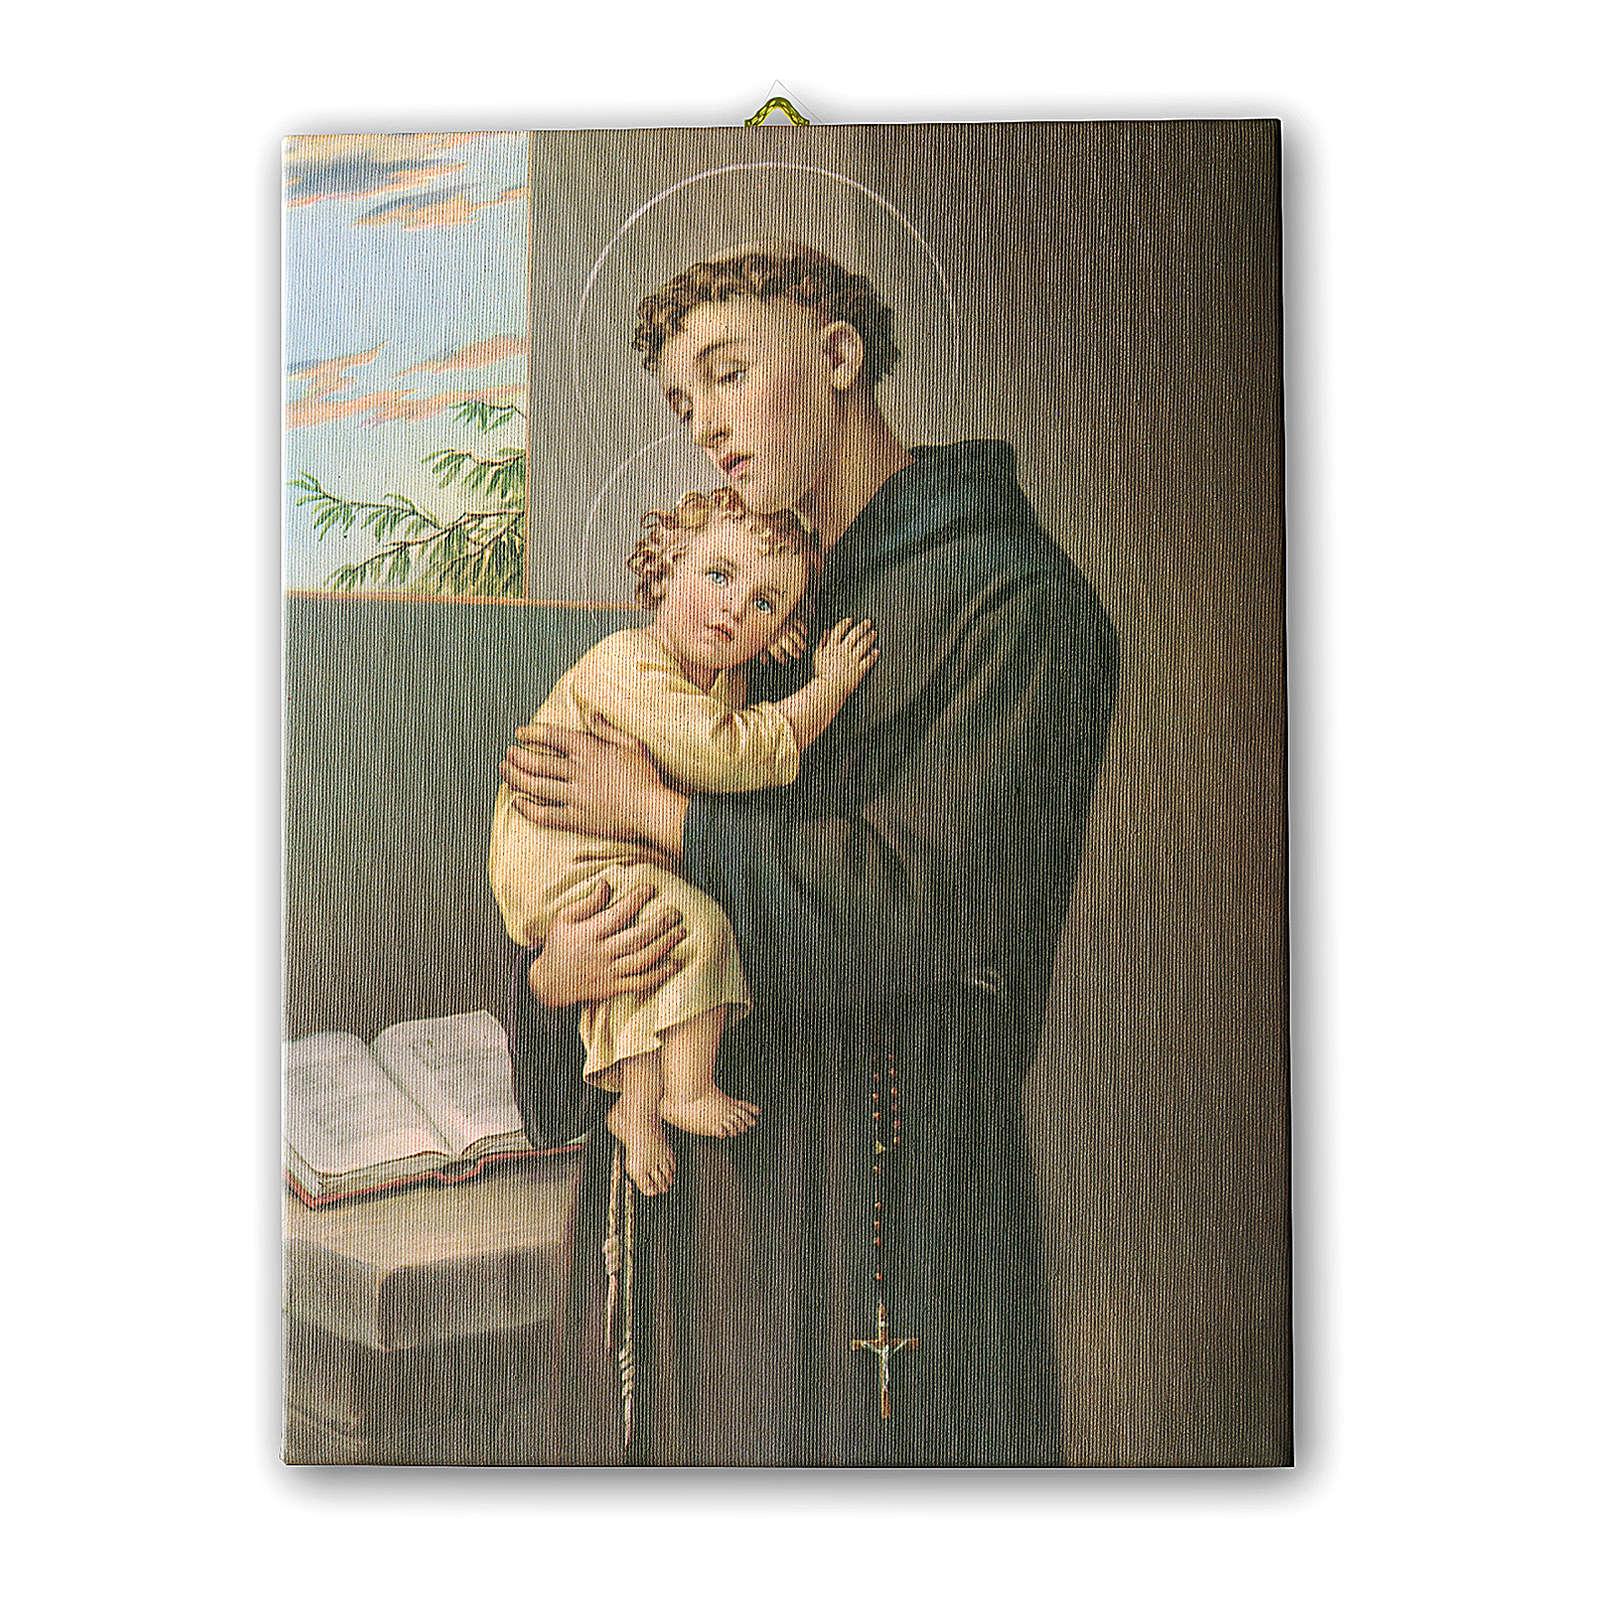 Painting on canvas Saint Anthony of Padua 70x50 cm 3